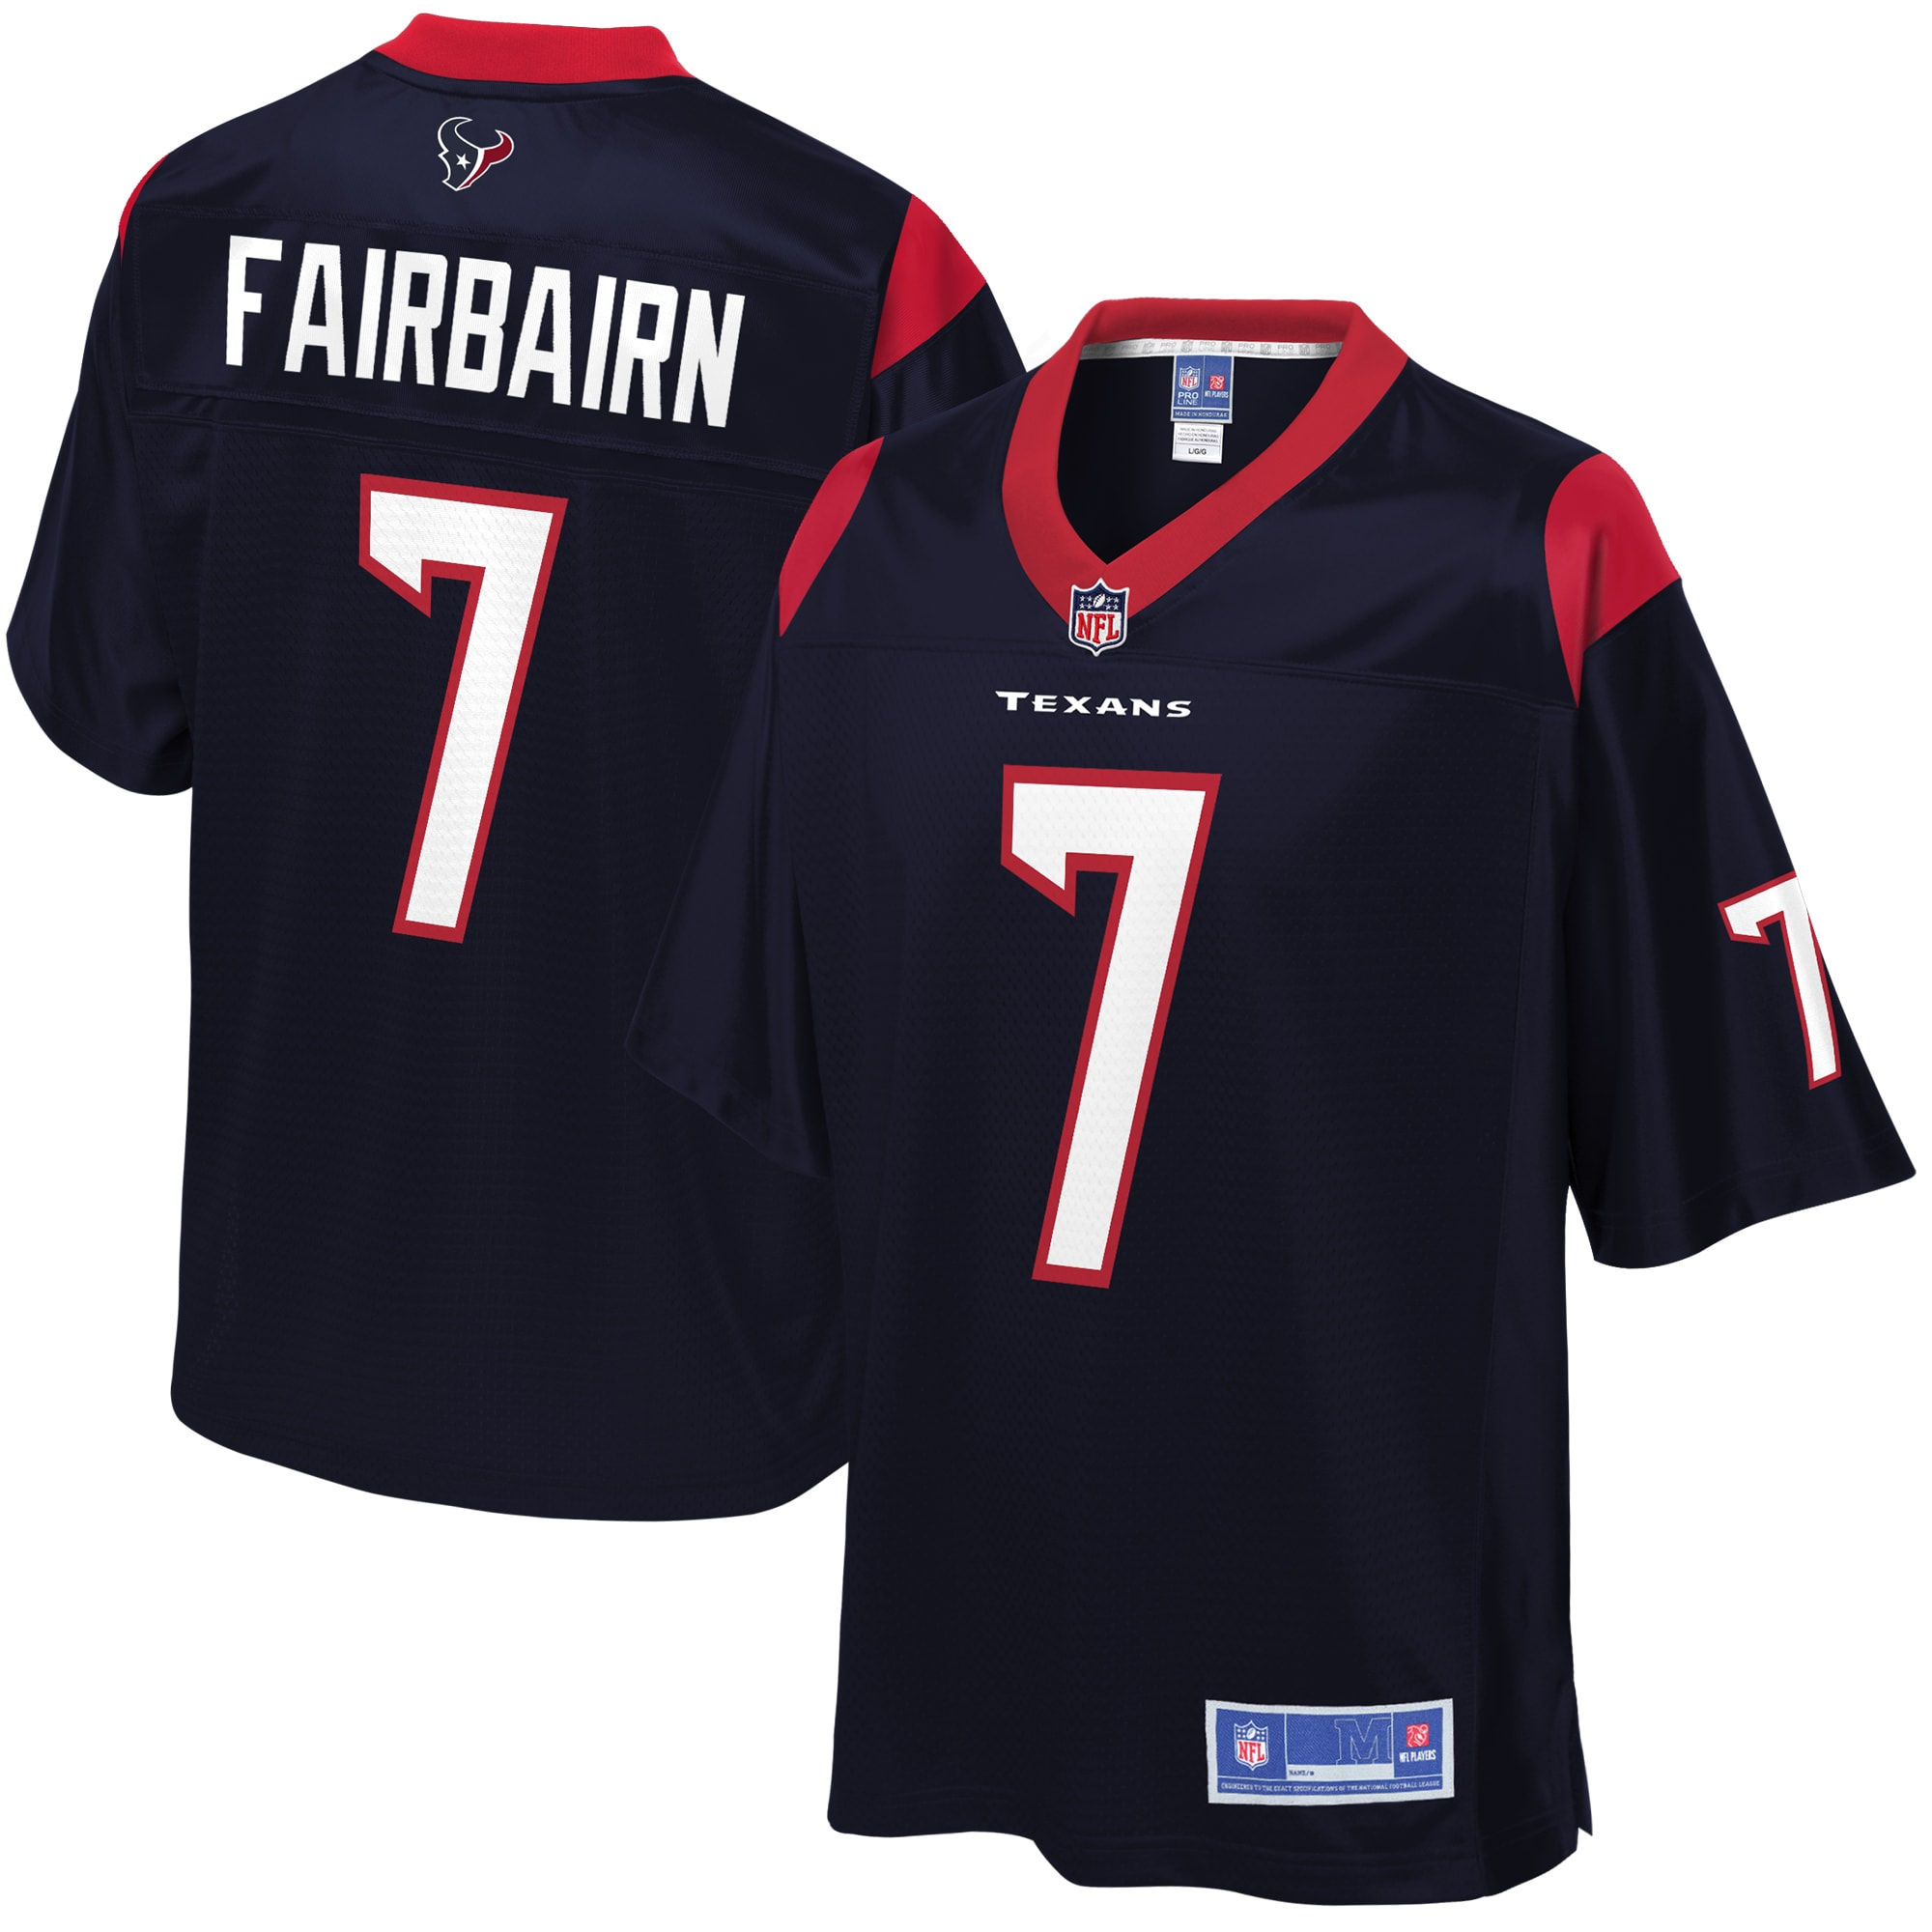 Ka'imi Fairbairn Houston Texans NFL Pro Line Youth Player Jersey - Navy